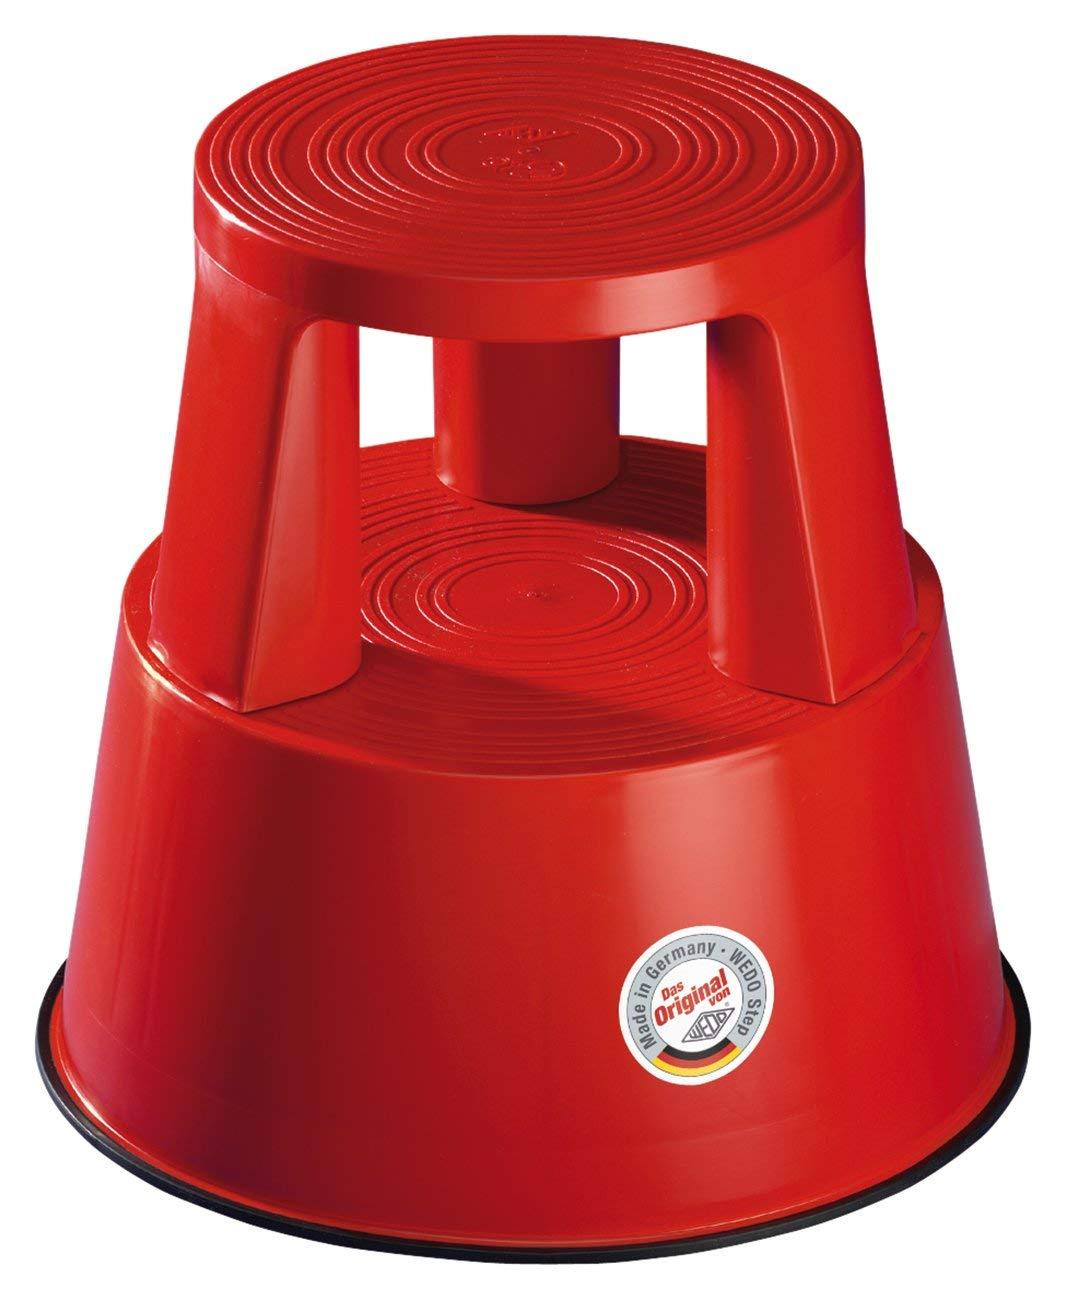 H/öhe 43 cm rot Tragkraft 150 kg Wedo 212202 Rollhocker Step aus Kunststoff